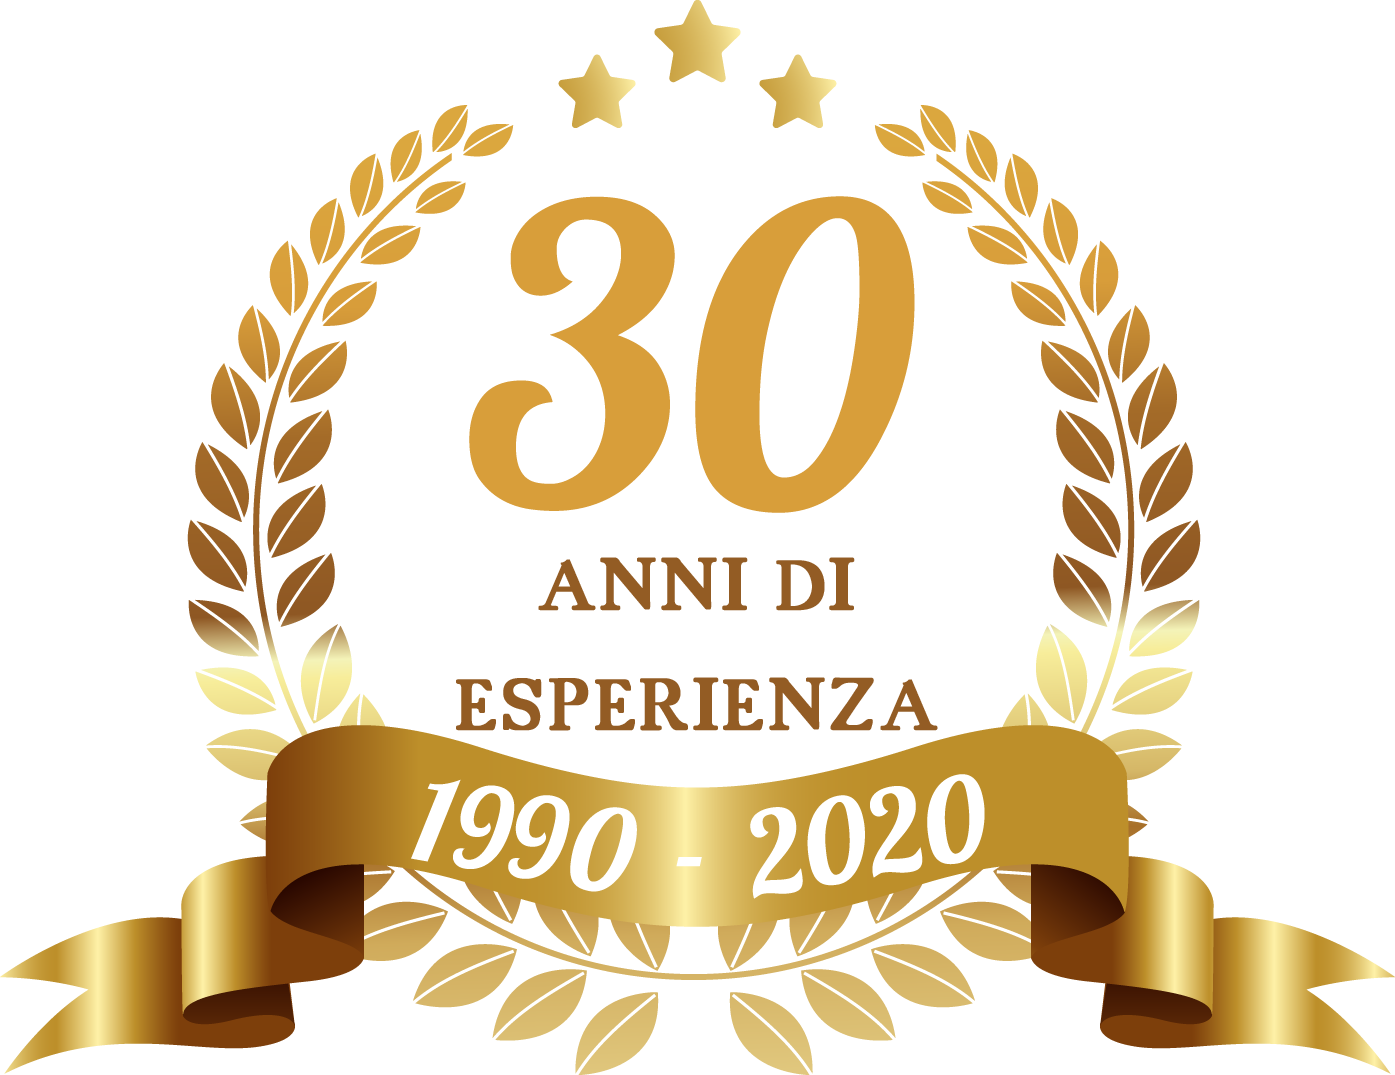 30 anni di esperienza